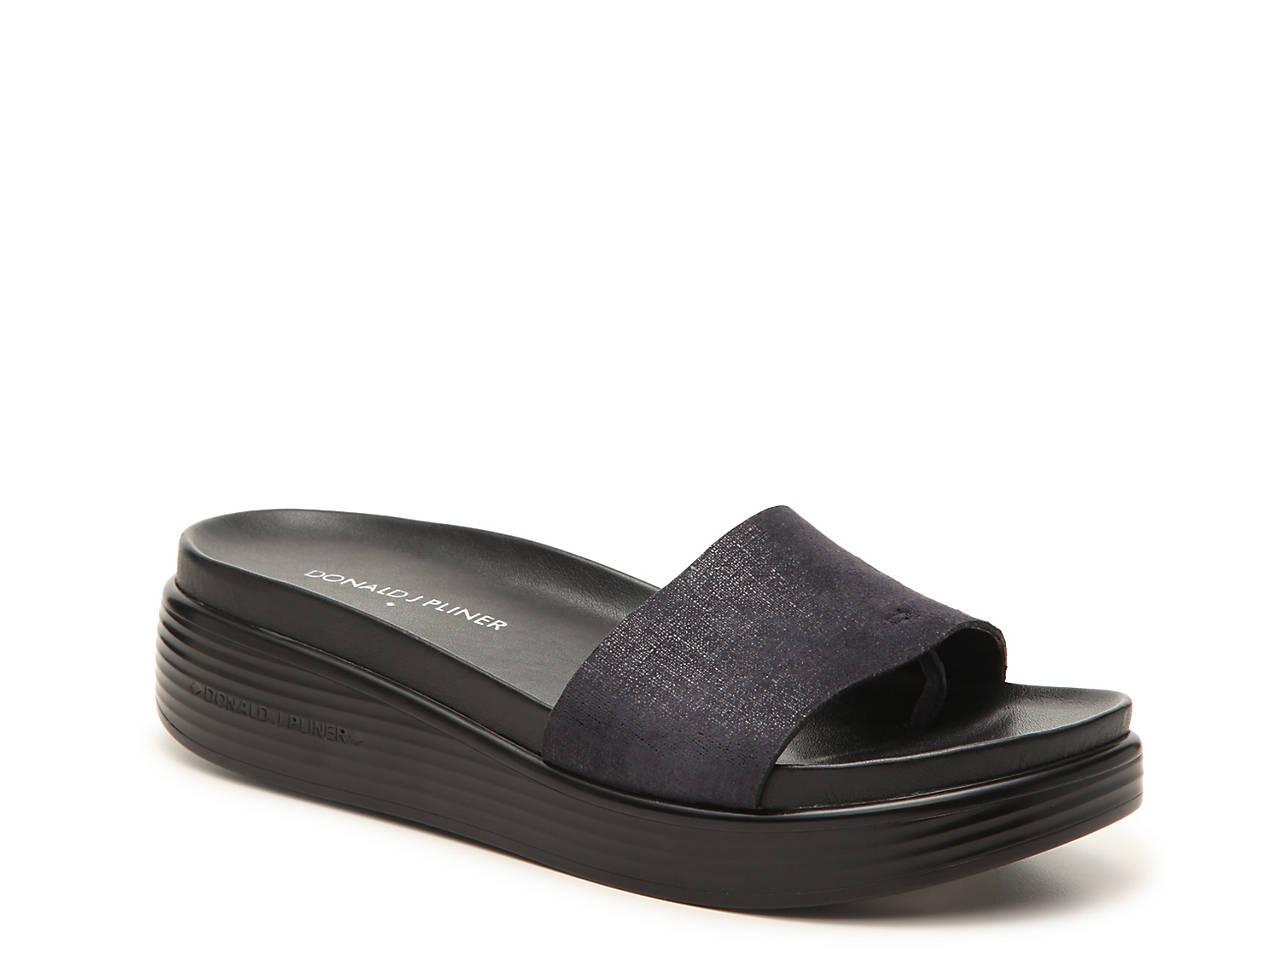 fbc54961ec5 Donald Pliner Fiji Slide Sandal Women s Shoes